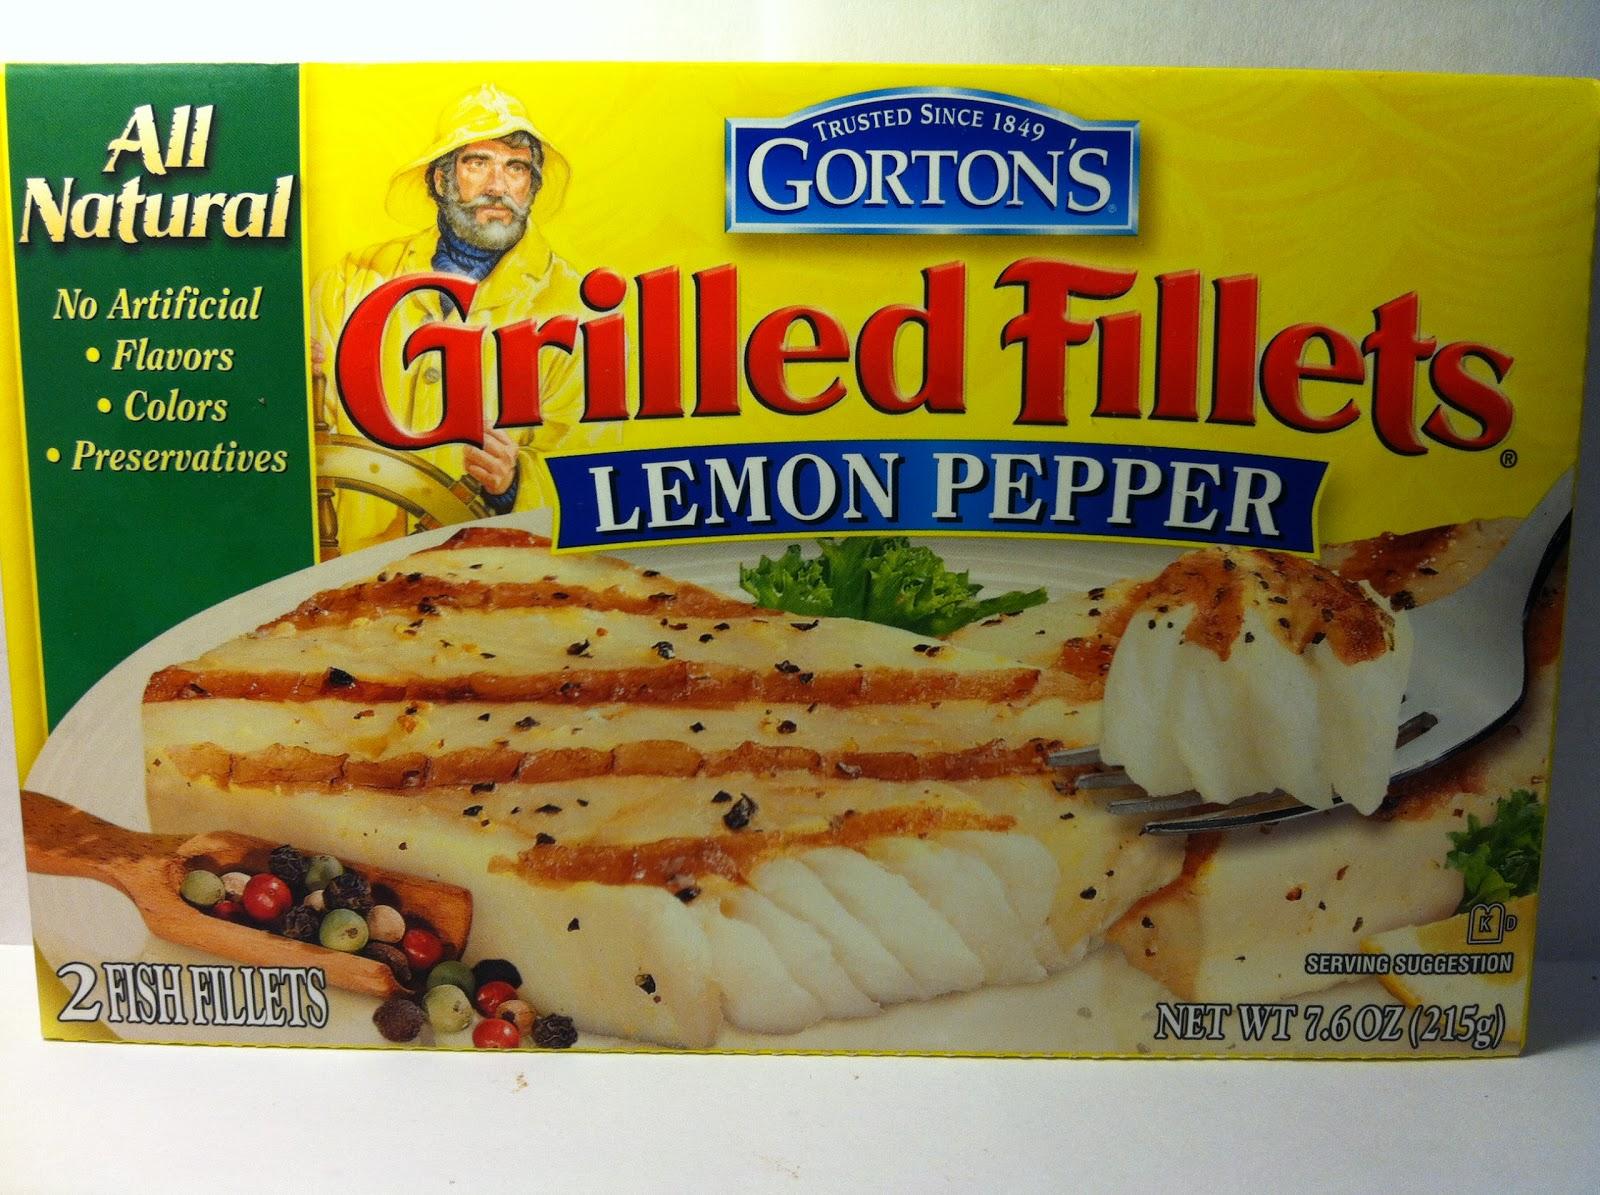 Crazy food dude review gorton 39 s grilled fillets lemon for Gordon fish sticks